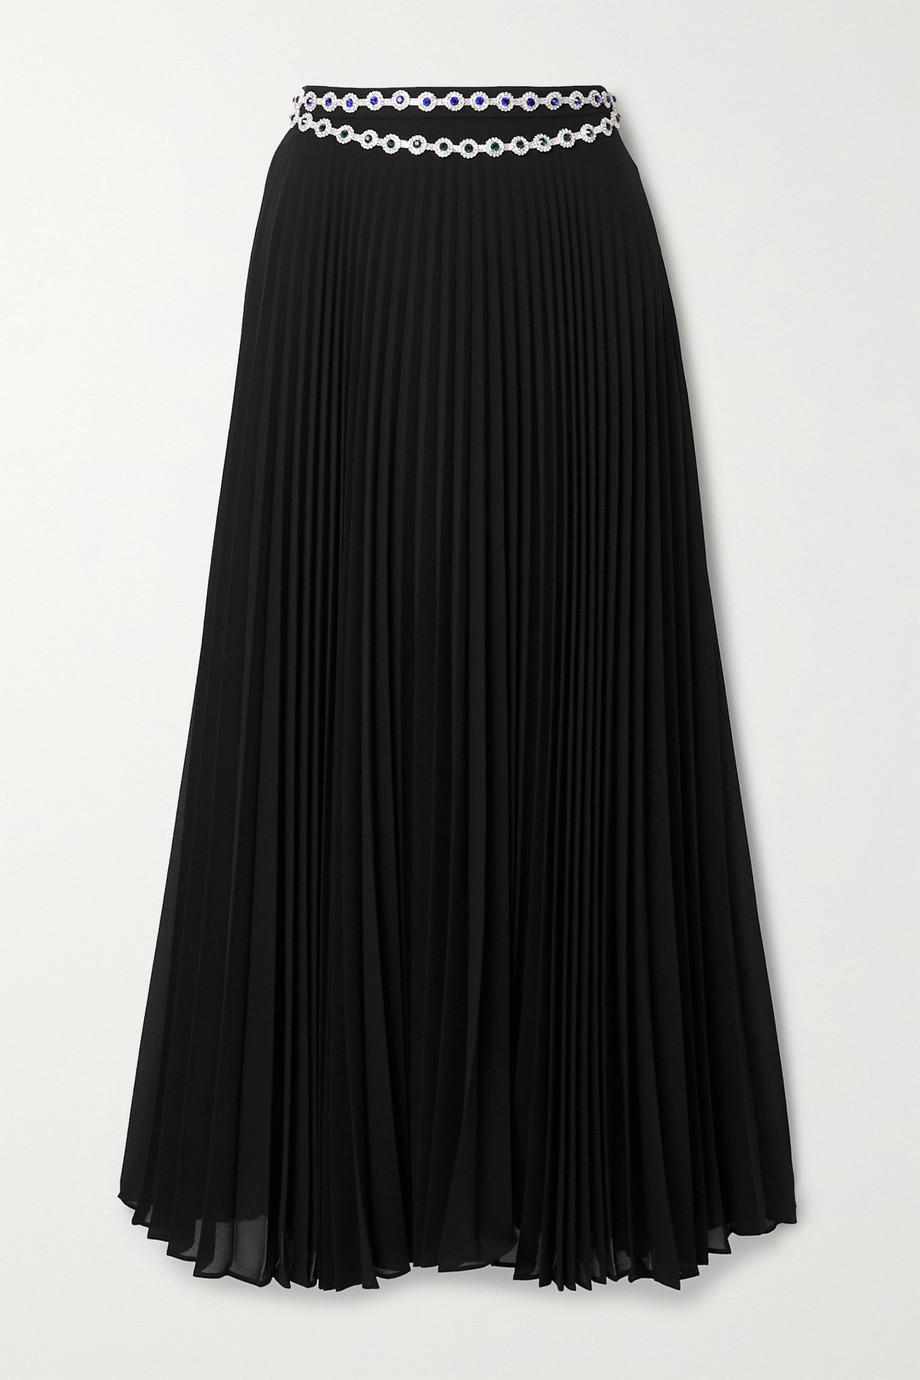 Christopher Kane Crystal-embellished pleated crepe midi skirt